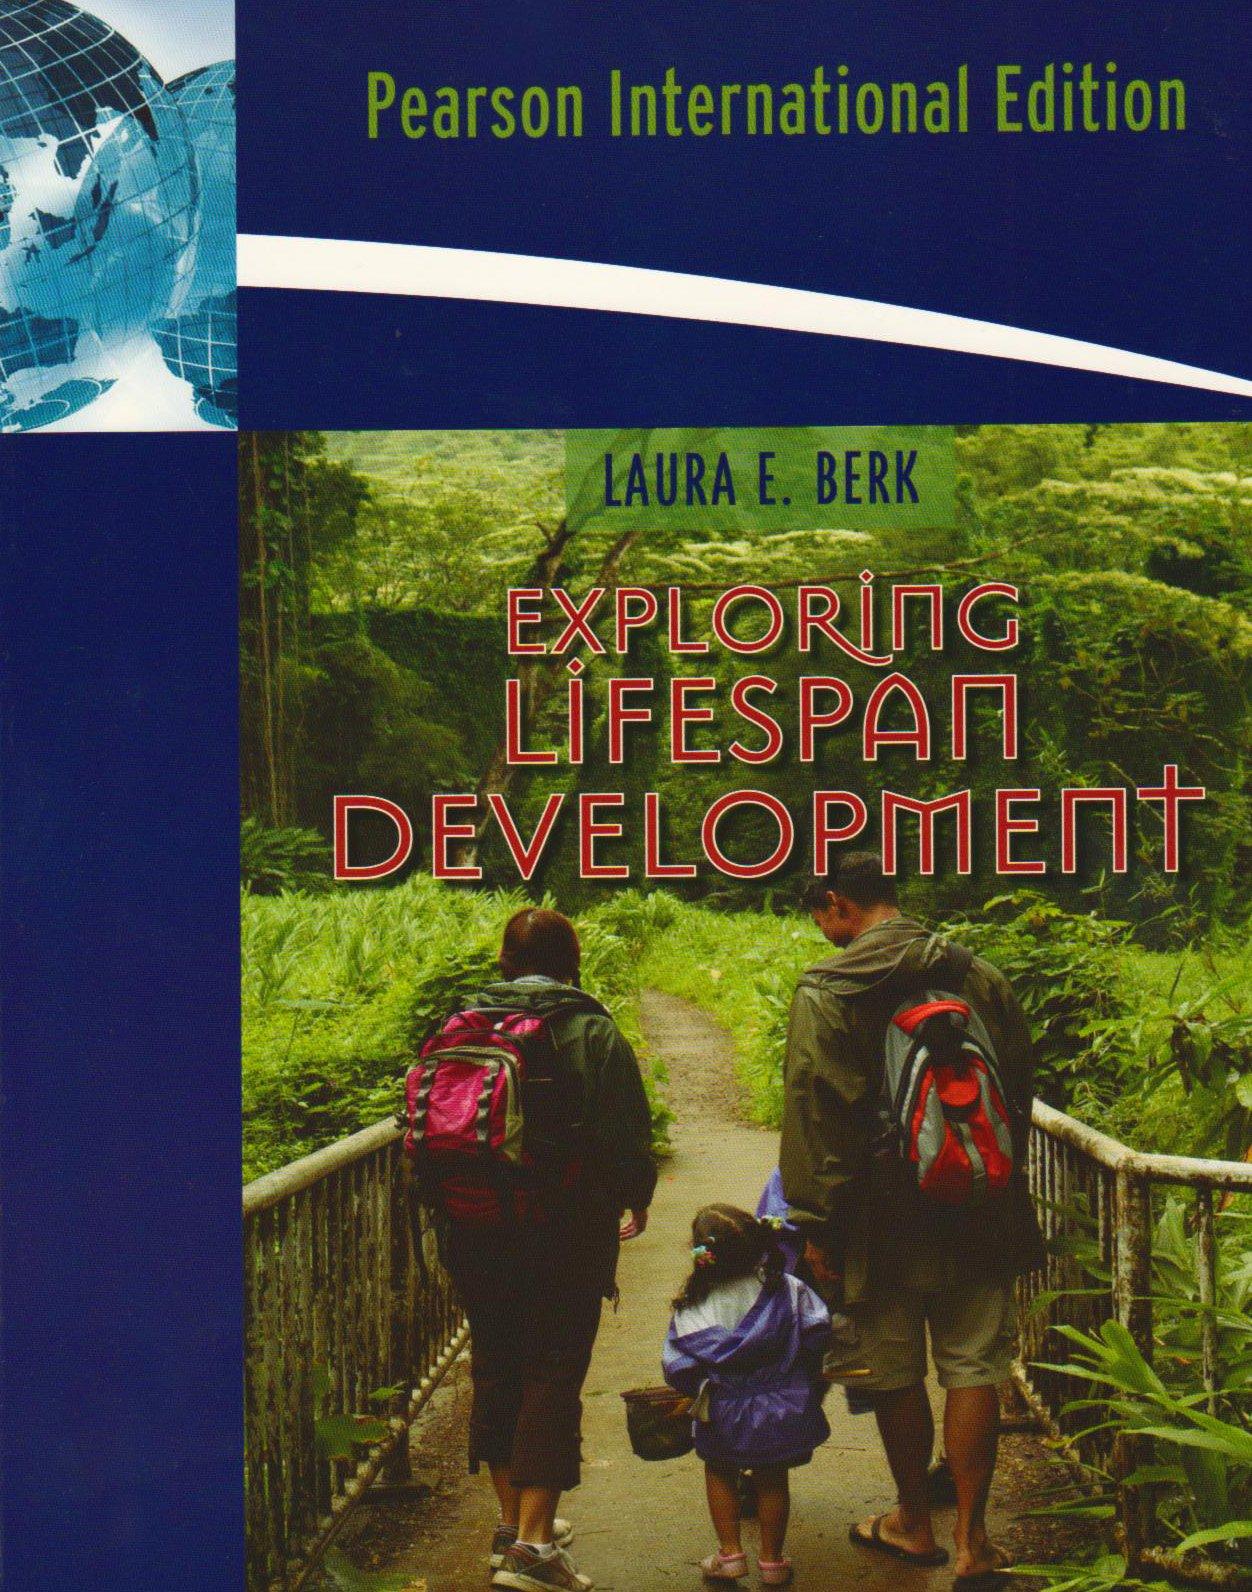 Exploring lifespan development laura e berk 9780205678693 amazon exploring lifespan development laura e berk 9780205678693 amazon books fandeluxe Image collections